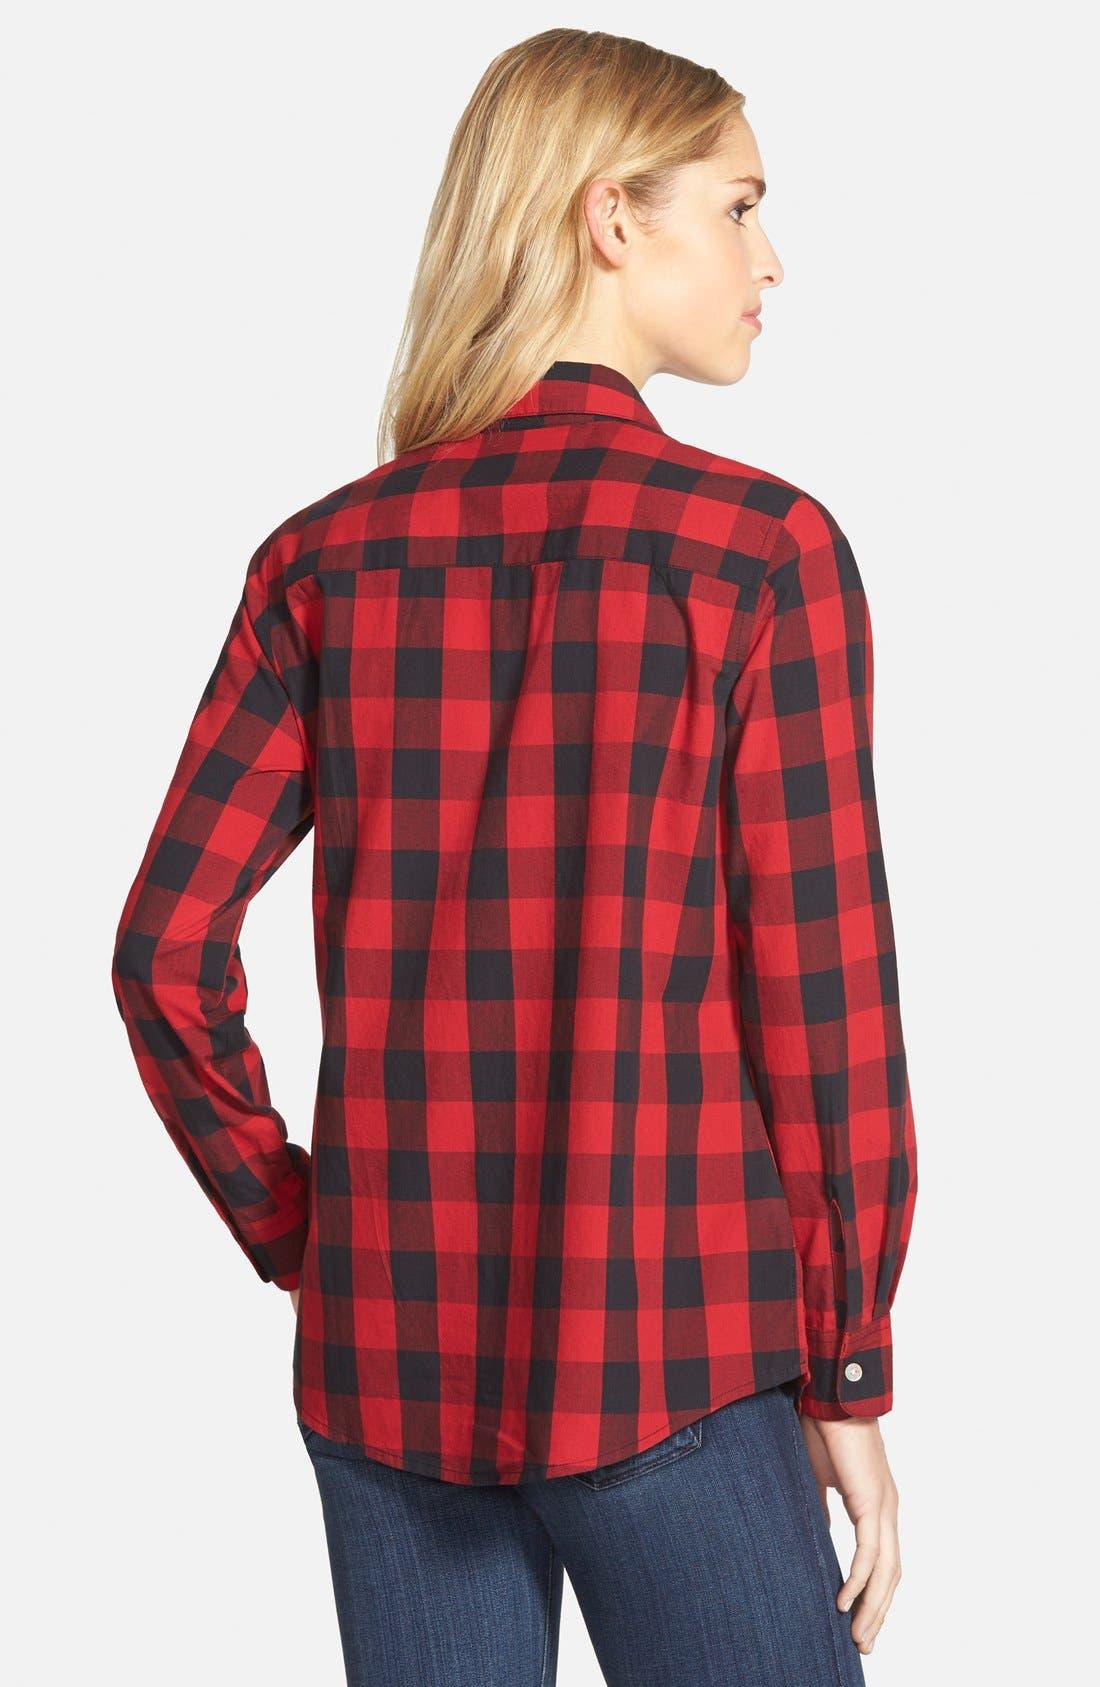 FOXCROFT,                             Buffalo Check Cotton Shirt,                             Alternate thumbnail 3, color,                             640